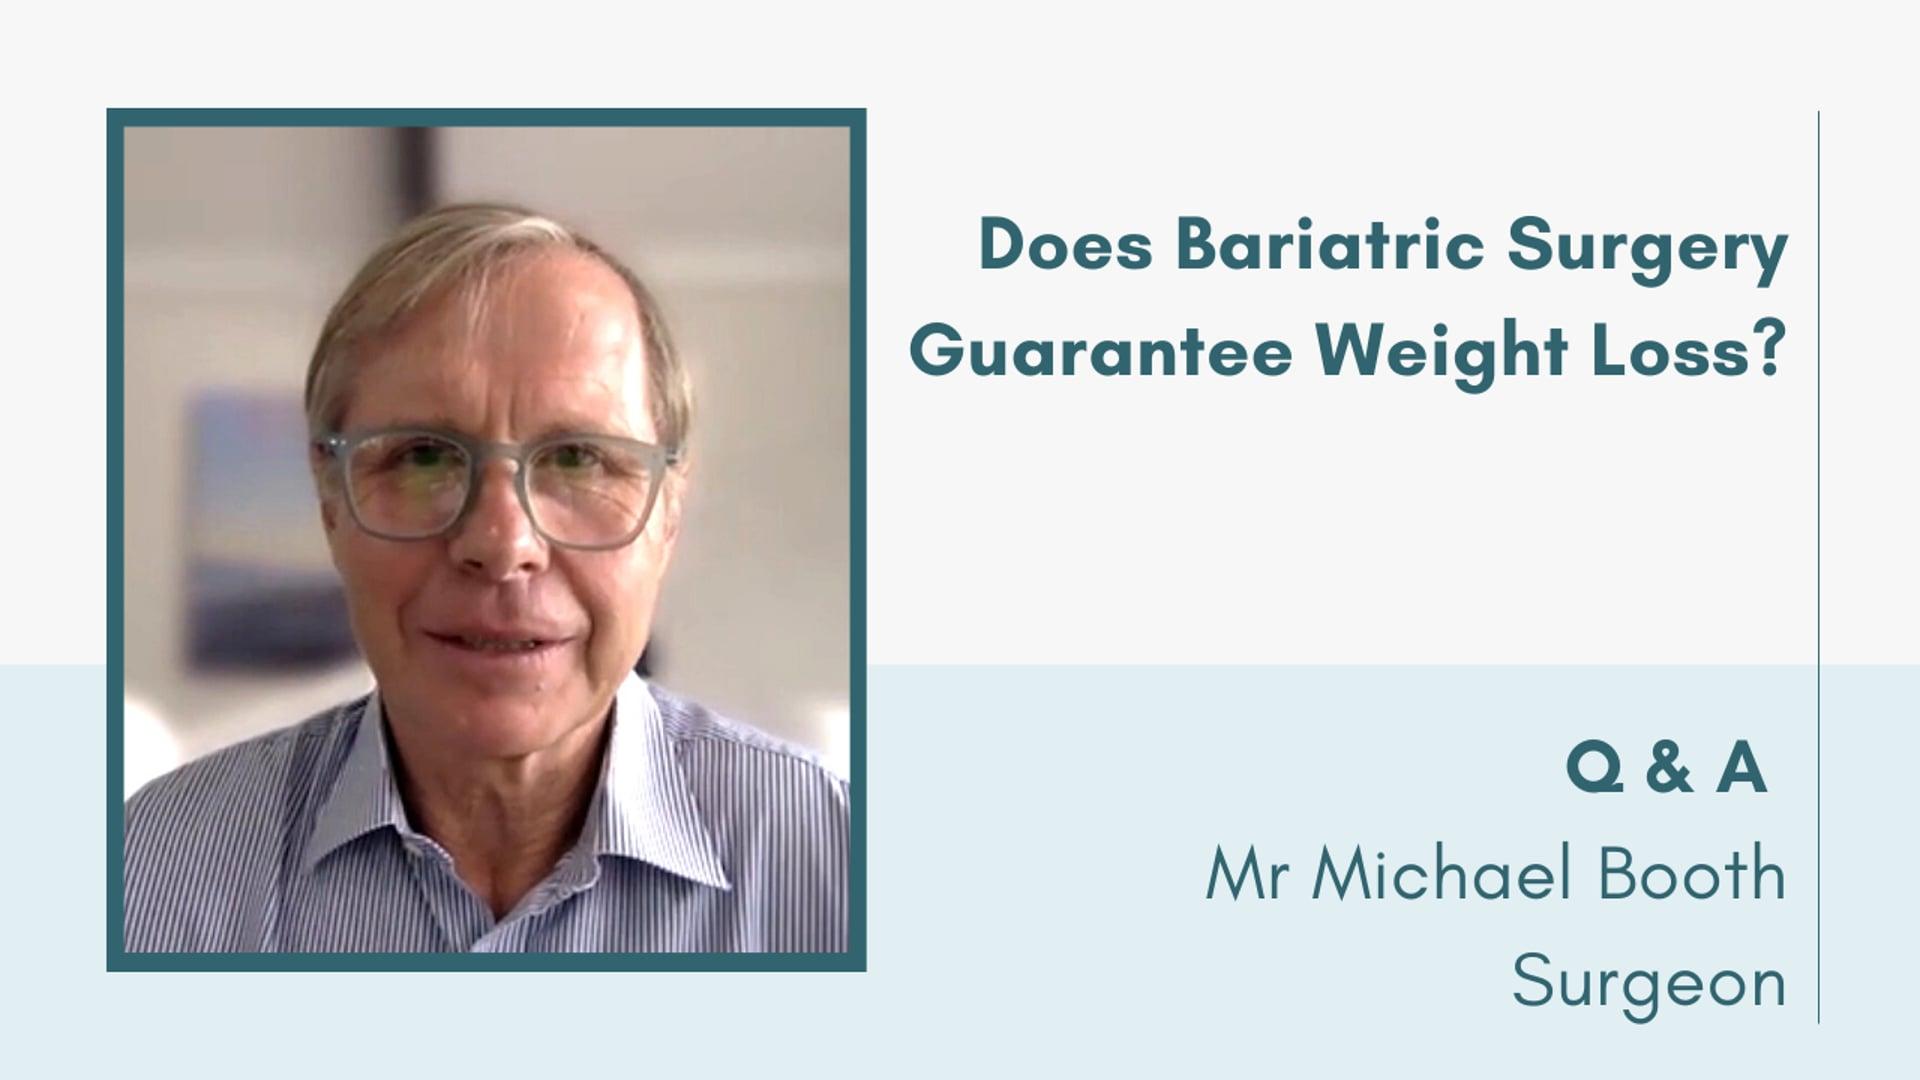 Does Bariatric Surgery Guarantee Weight Loss?